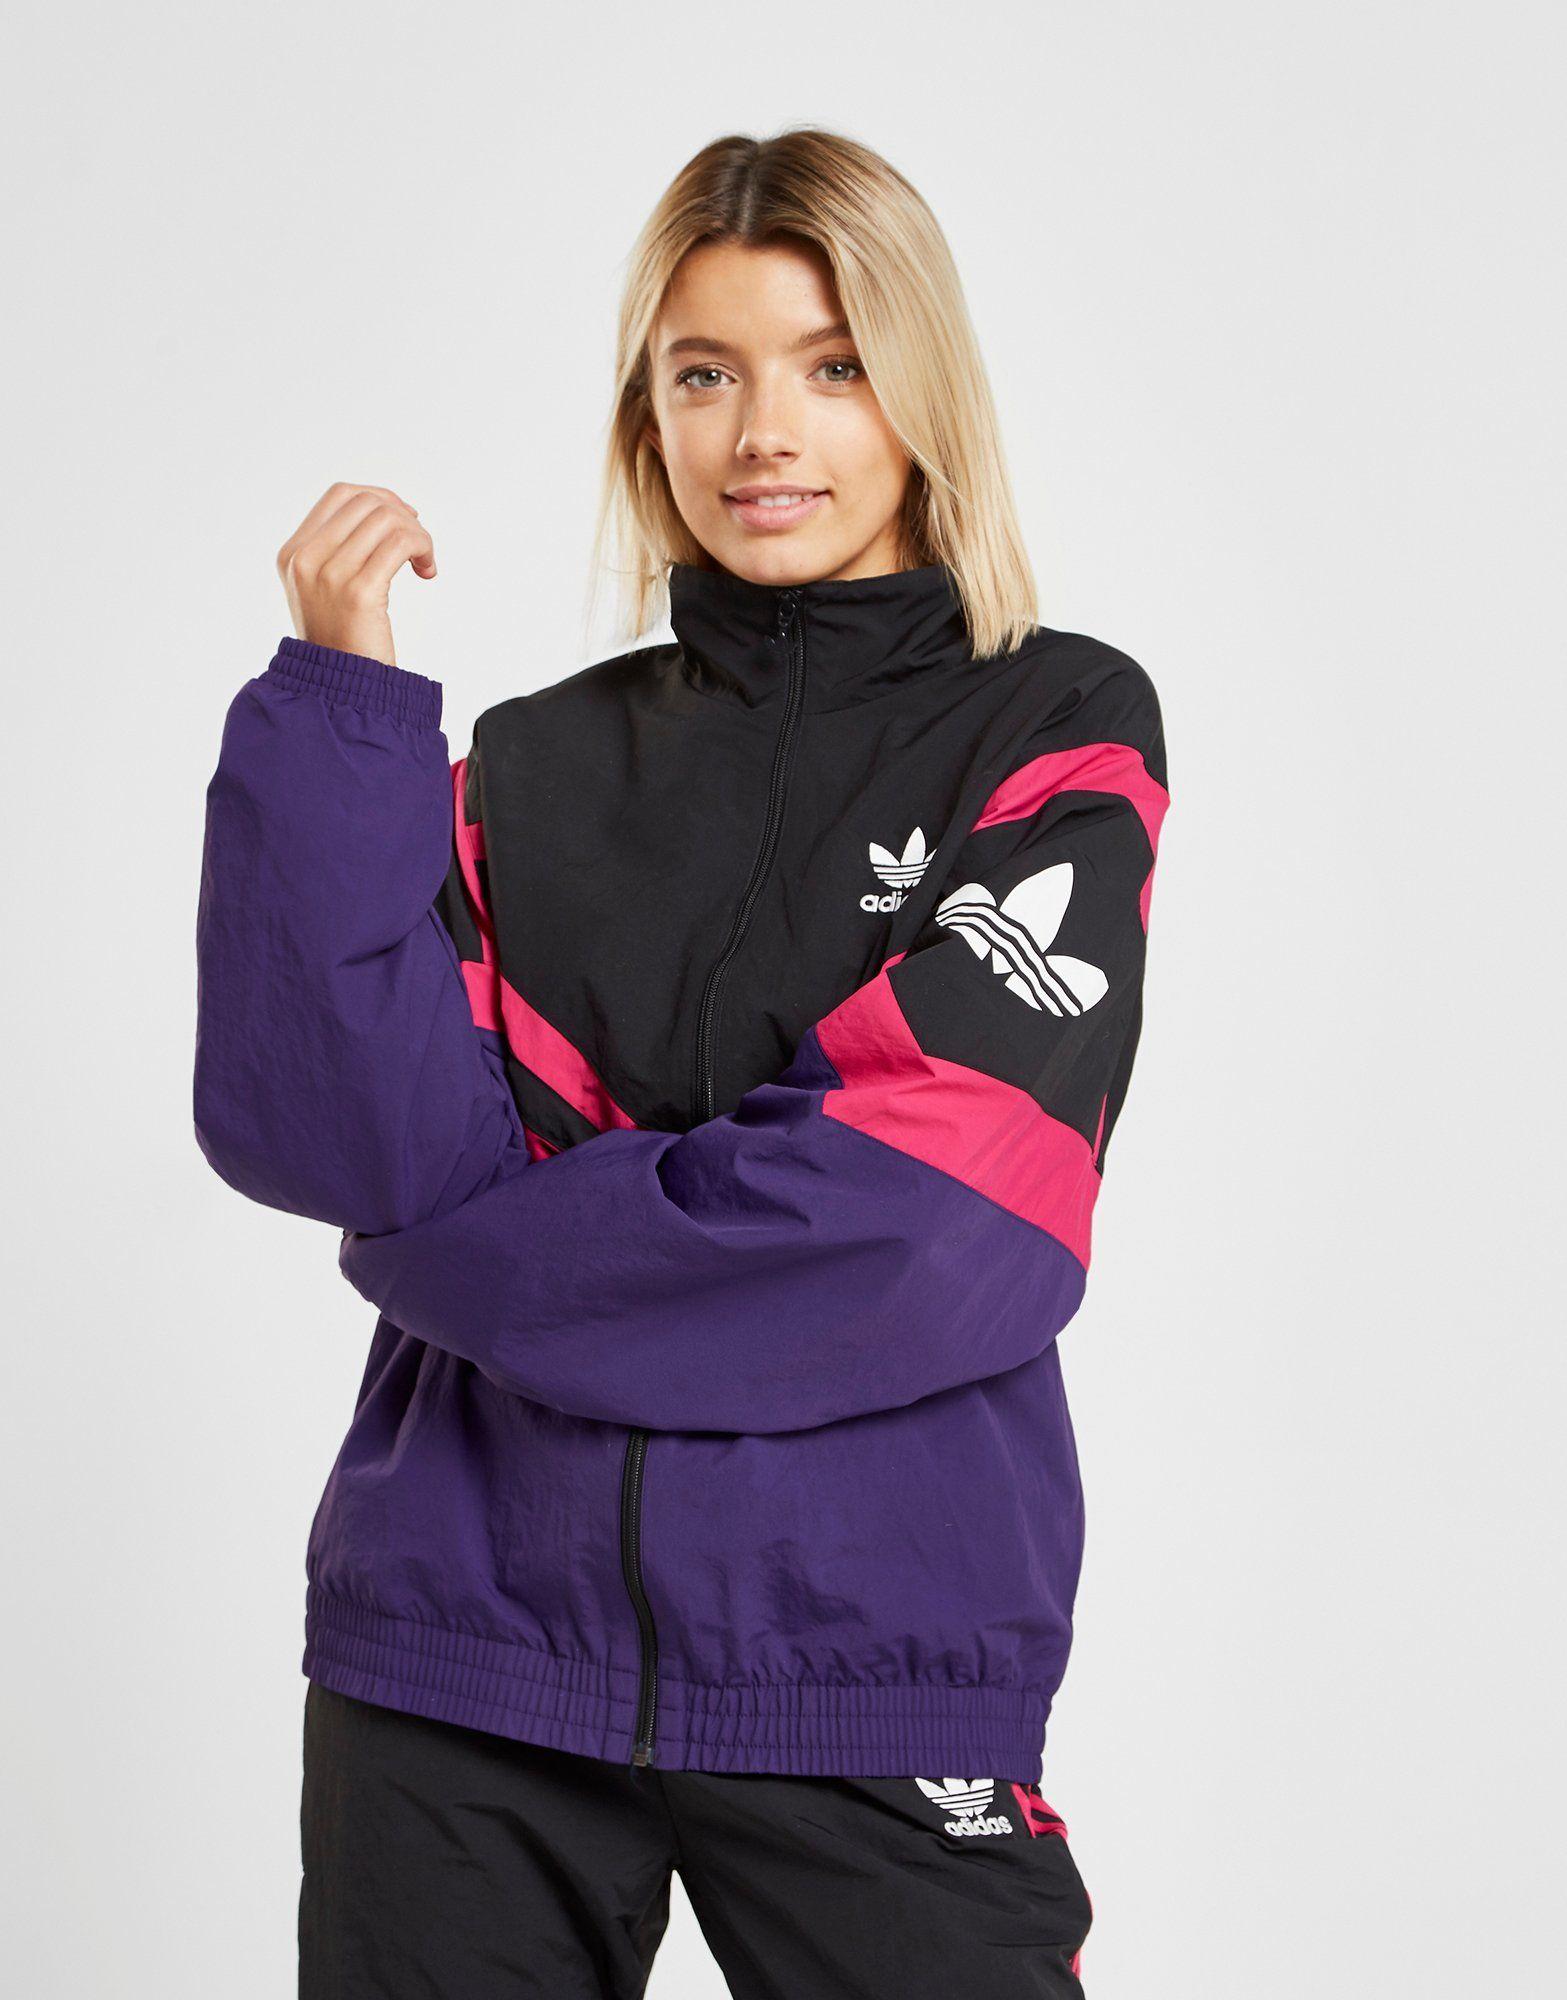 Adidas Femme Survetement 3